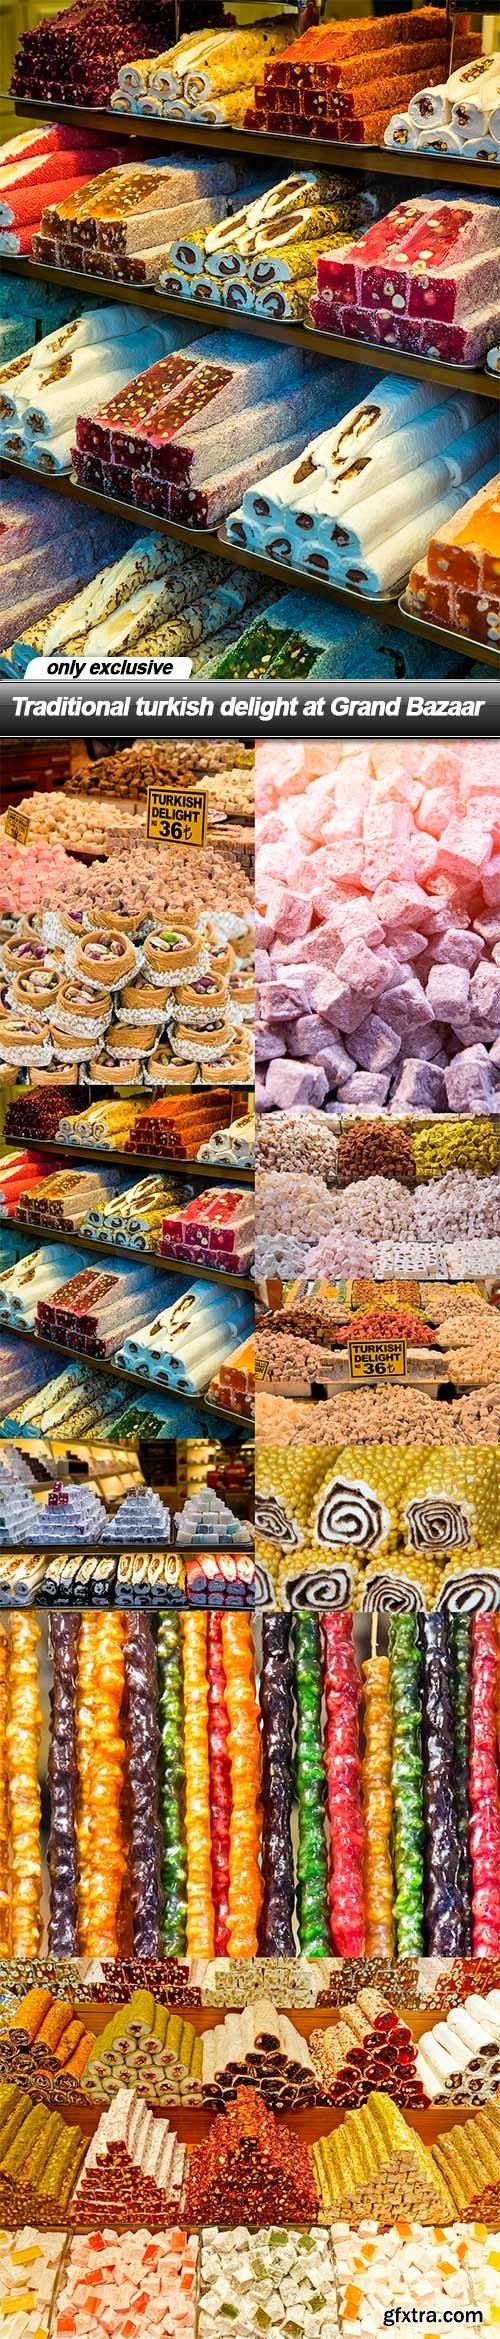 Traditional turkish delight at Grand Bazaar - 10 UHQ JPEG